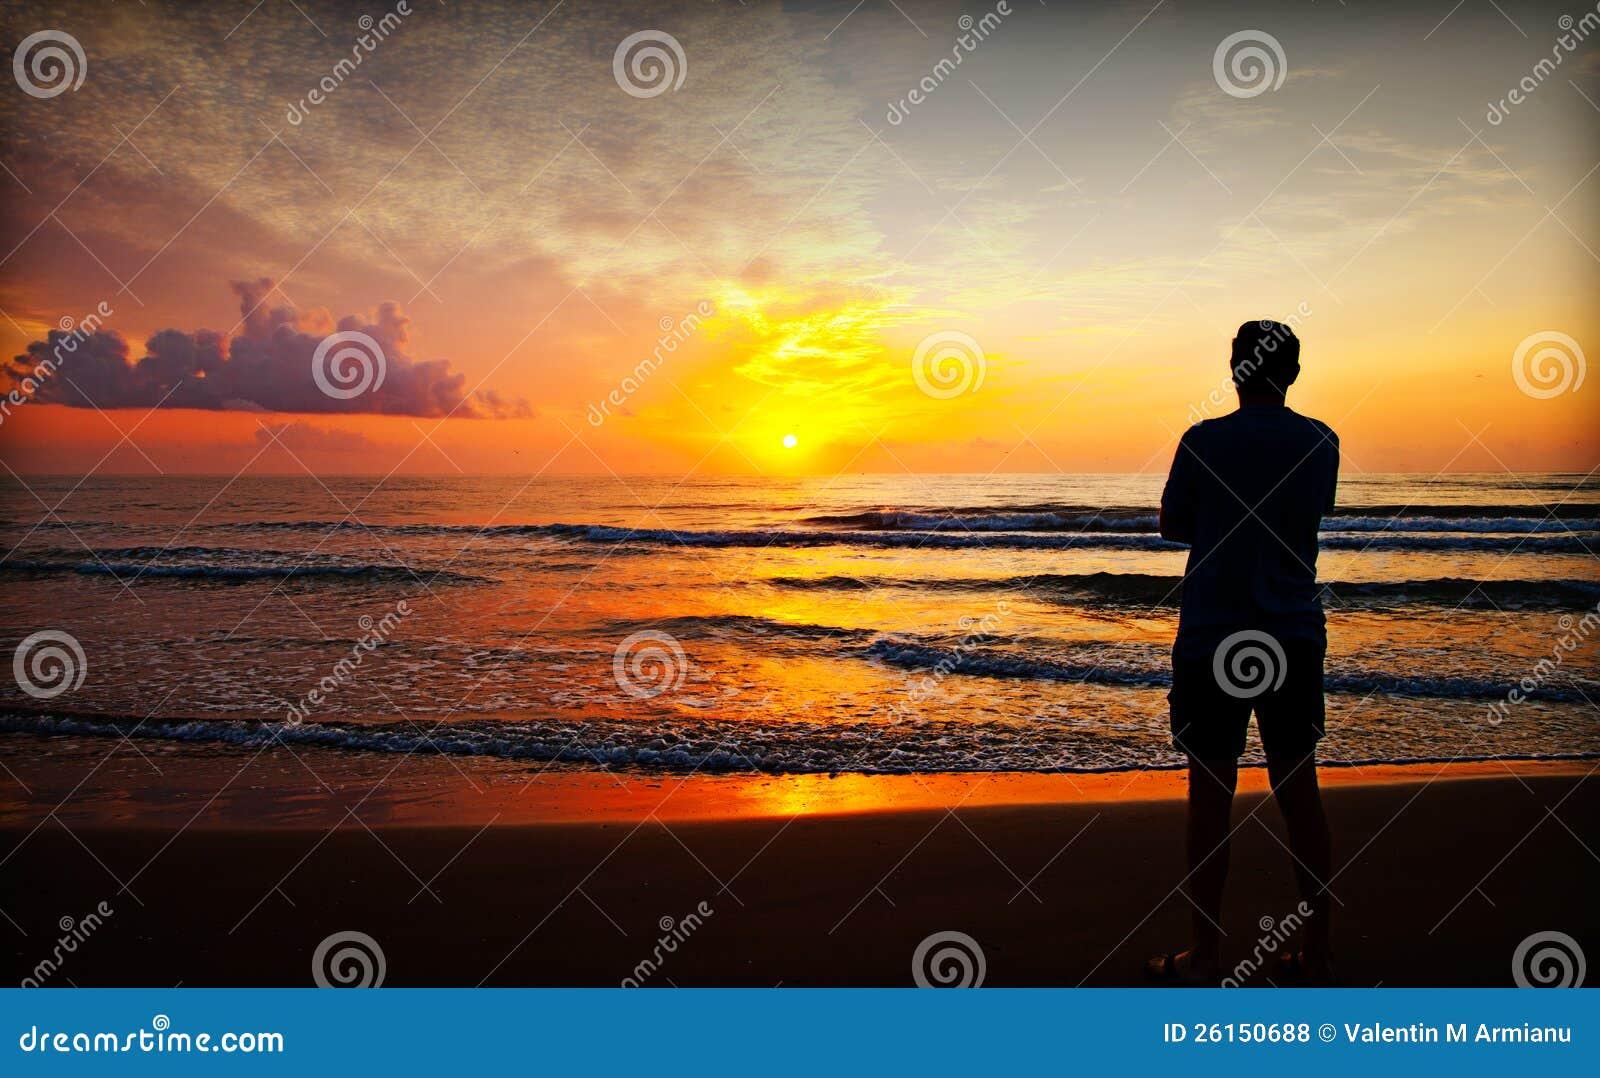 Silhouette on sunrise